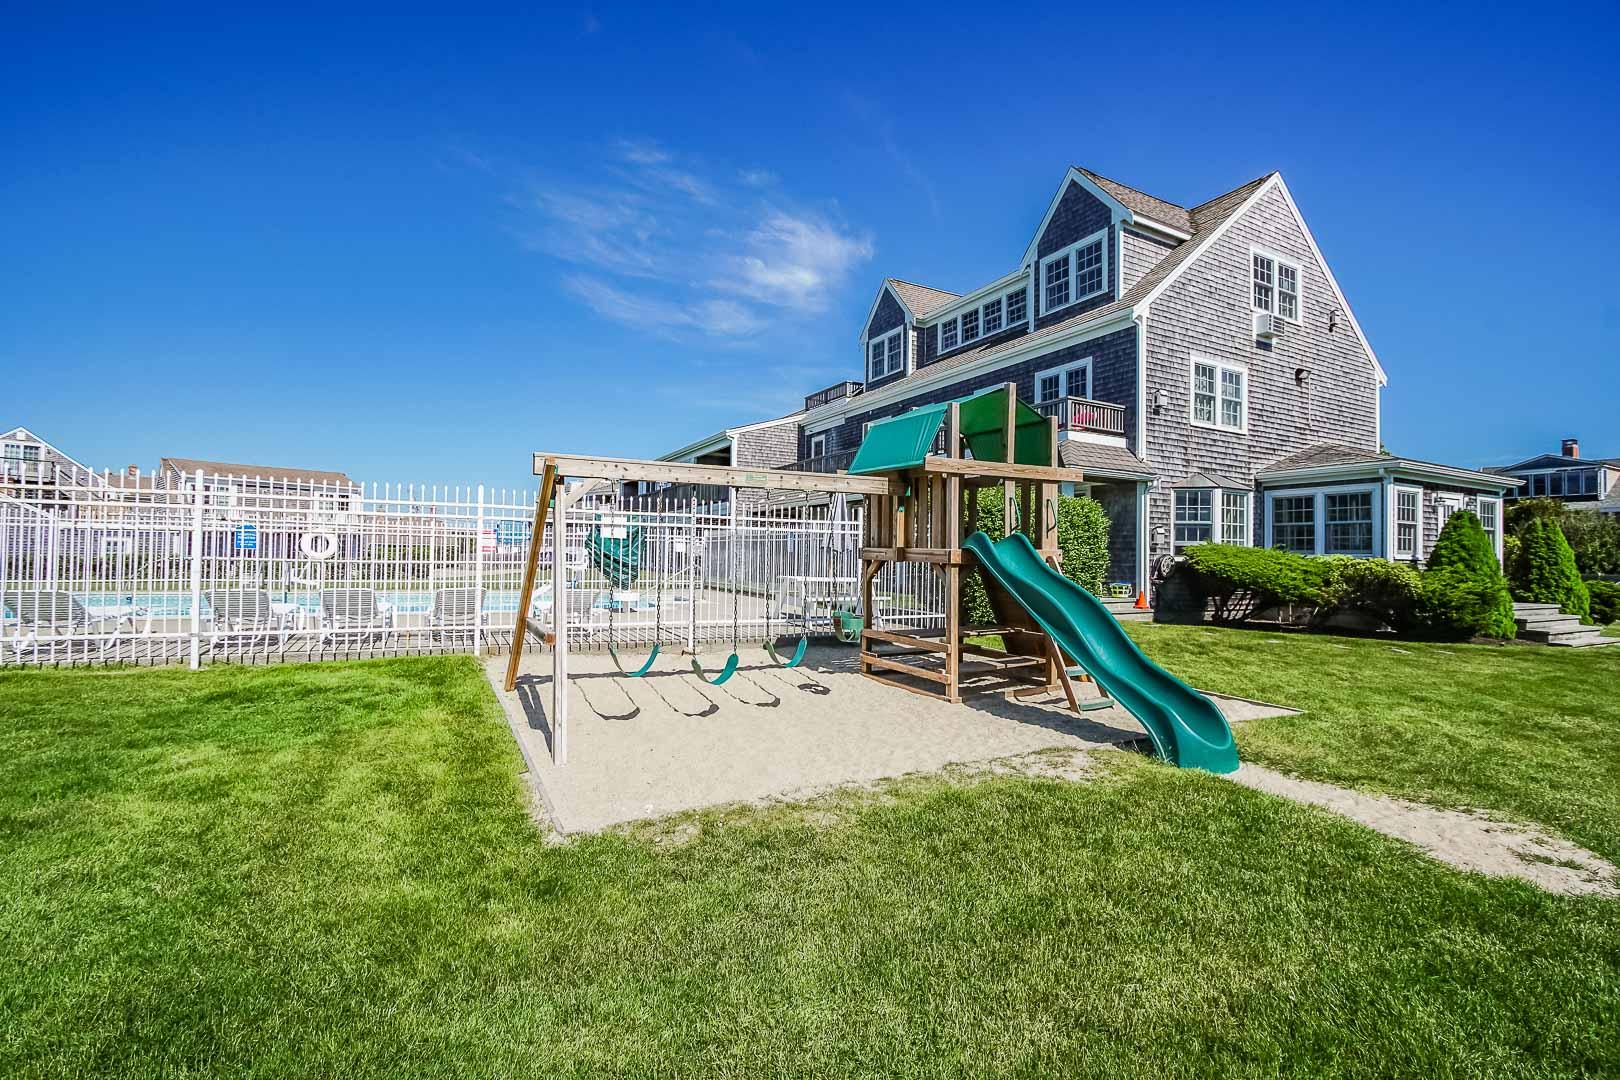 A lovely playground at VRI's Beachside Village Resort in Massachusetts.